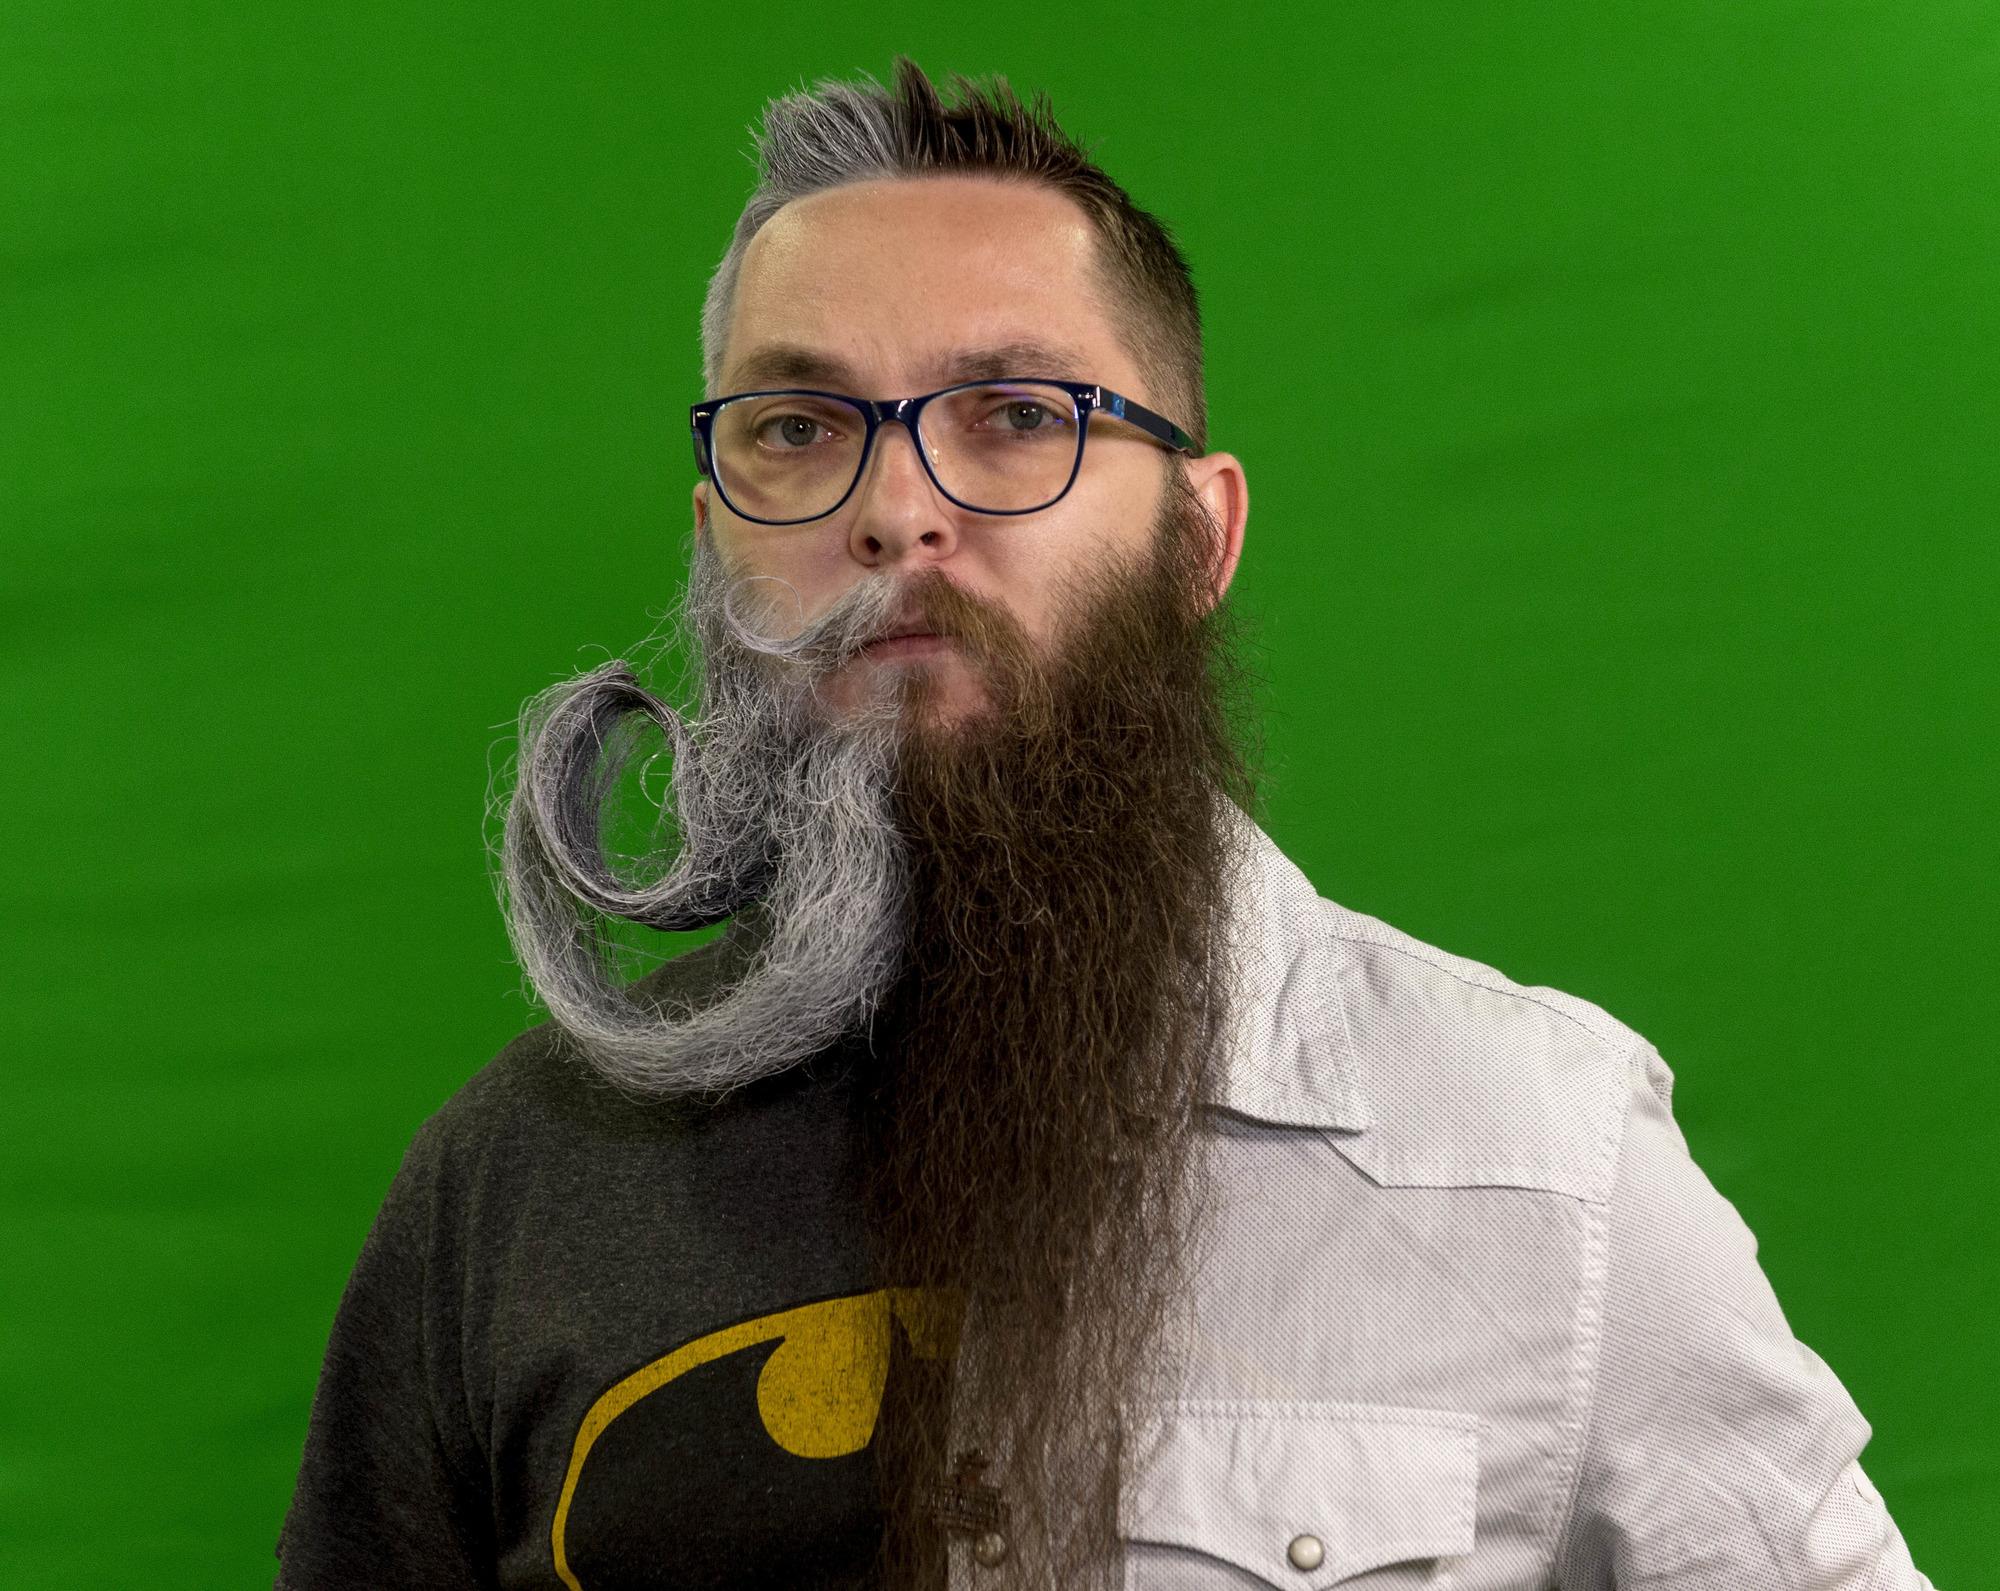 Nicht sichtbar bart Bart wächst